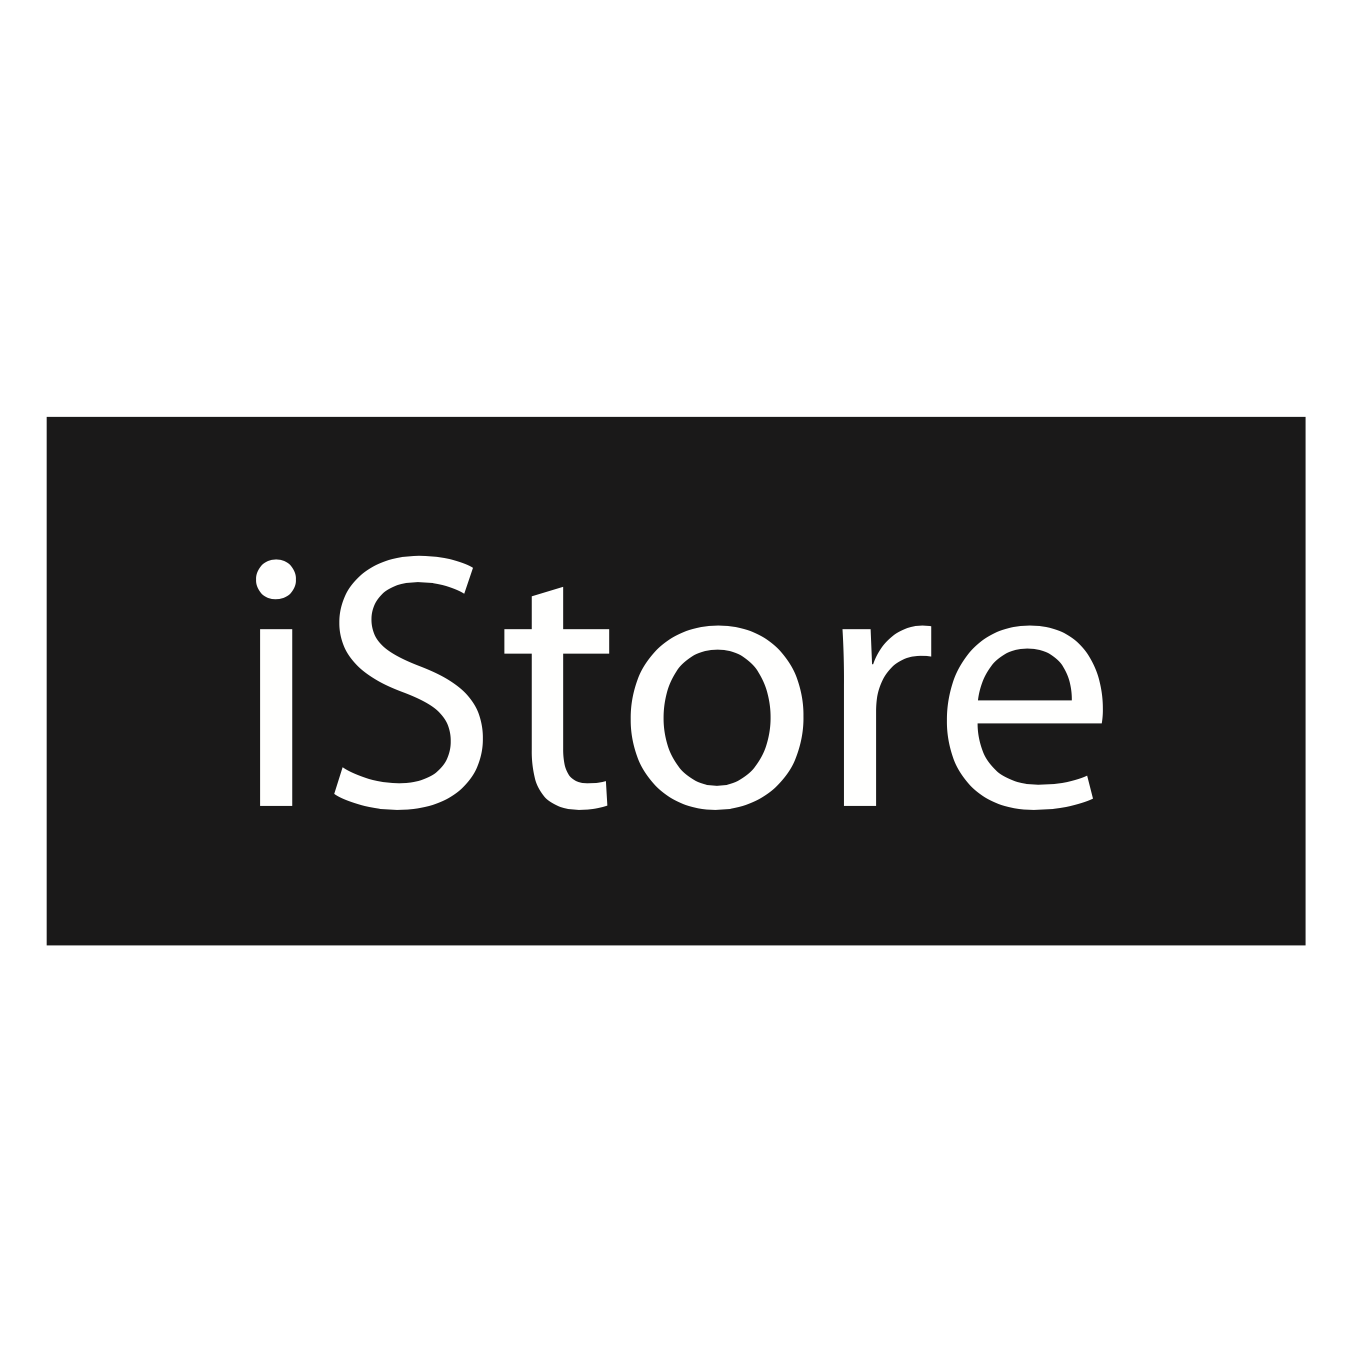 Kate Spade New York Wrap Case for iPhone 8/7 - Glitter Stripe Rose Quartz Saffian Silver